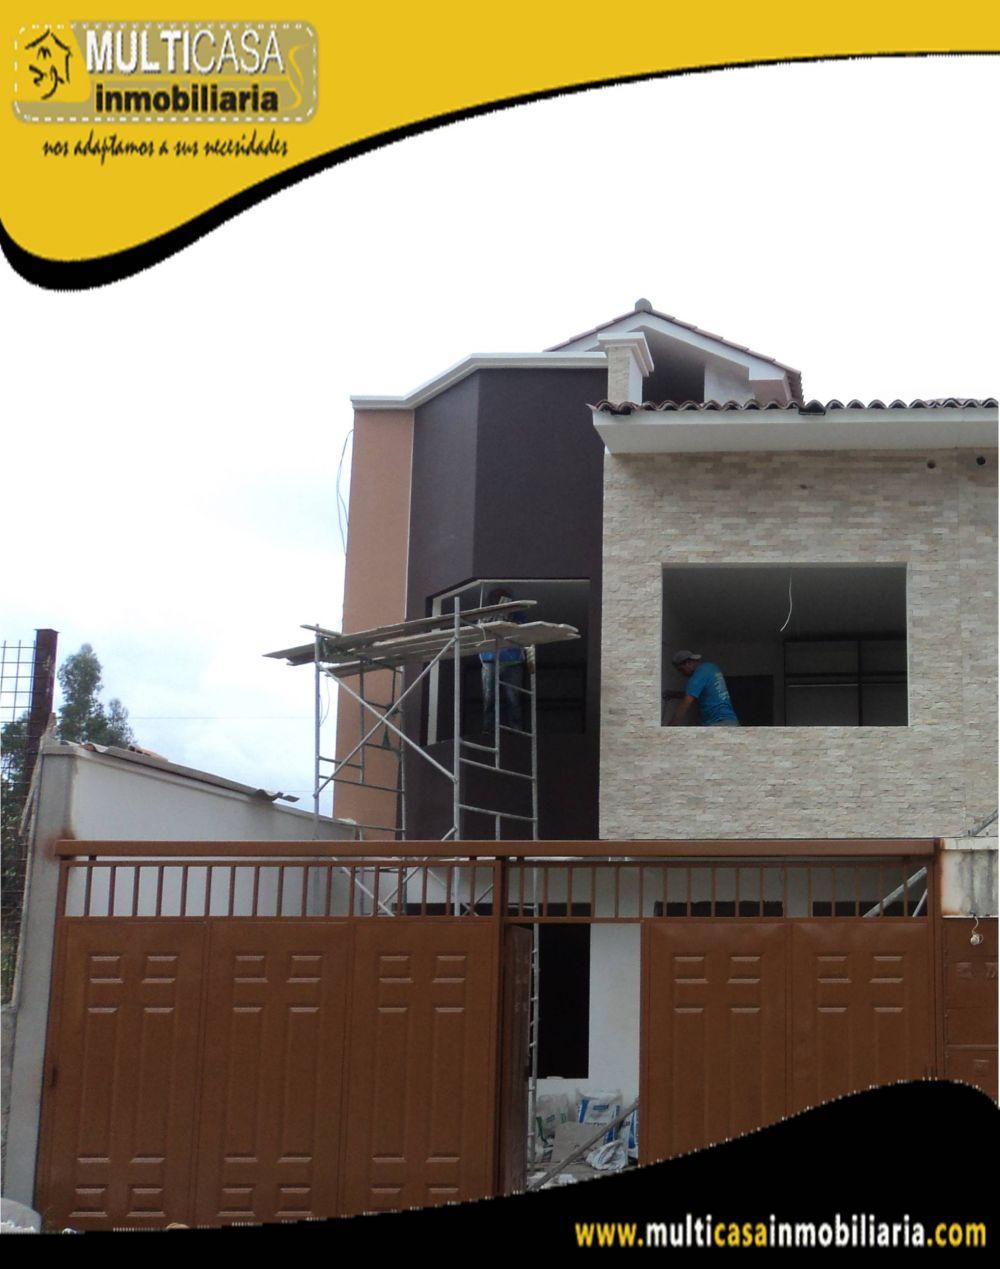 Casa en Venta a Crédito Sector Av.Ordoñez Lasso Cuenca-Ecuador